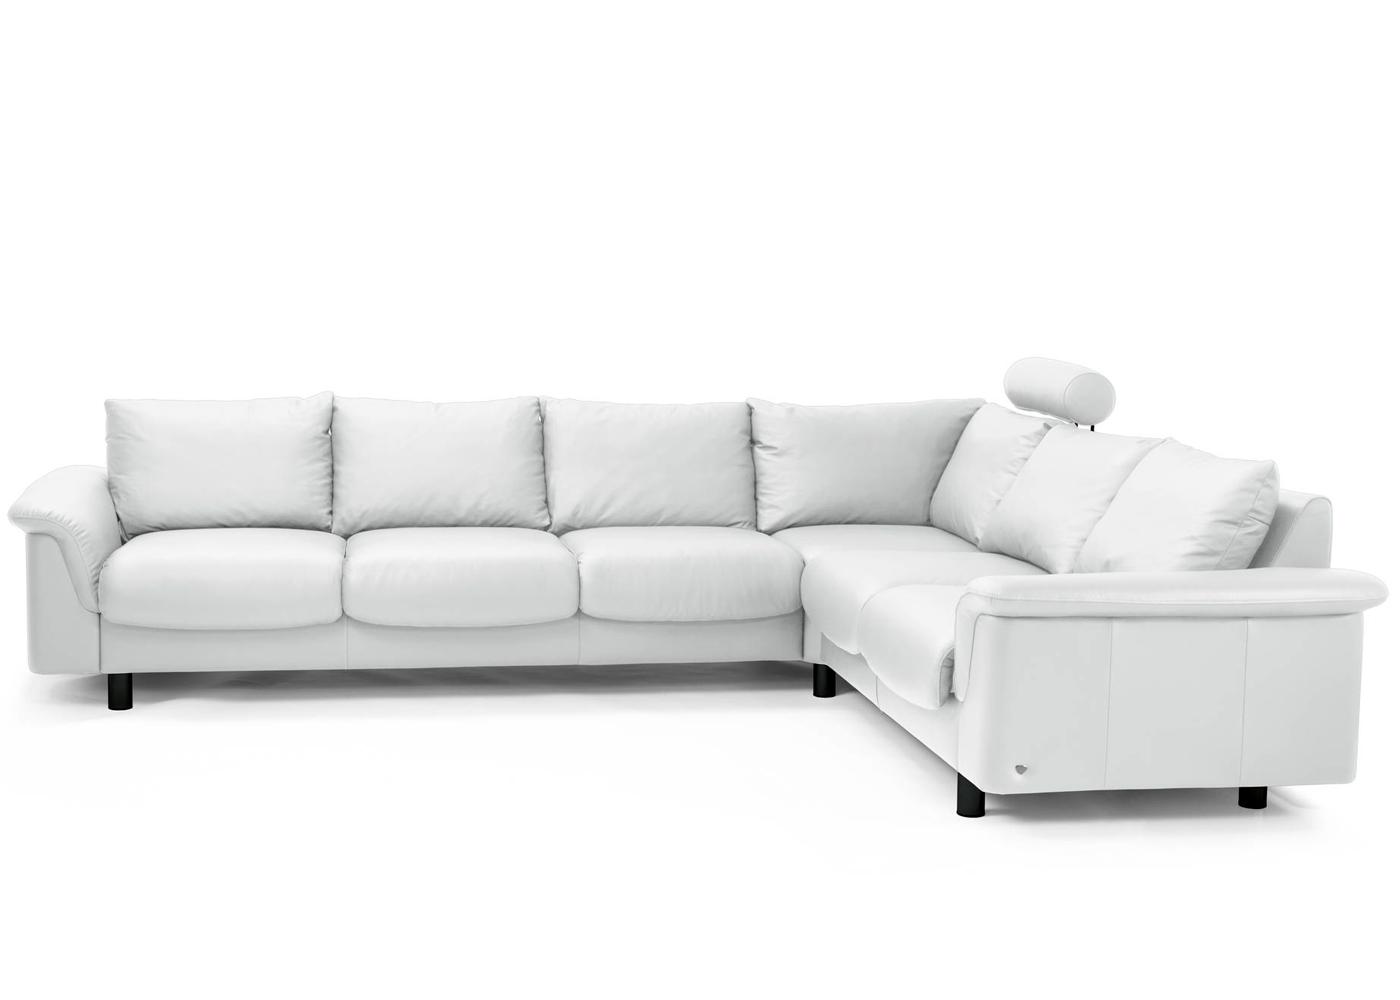 sofas for less uk camping near sofala stressless e300 corner sofa midfurn furniture superstore